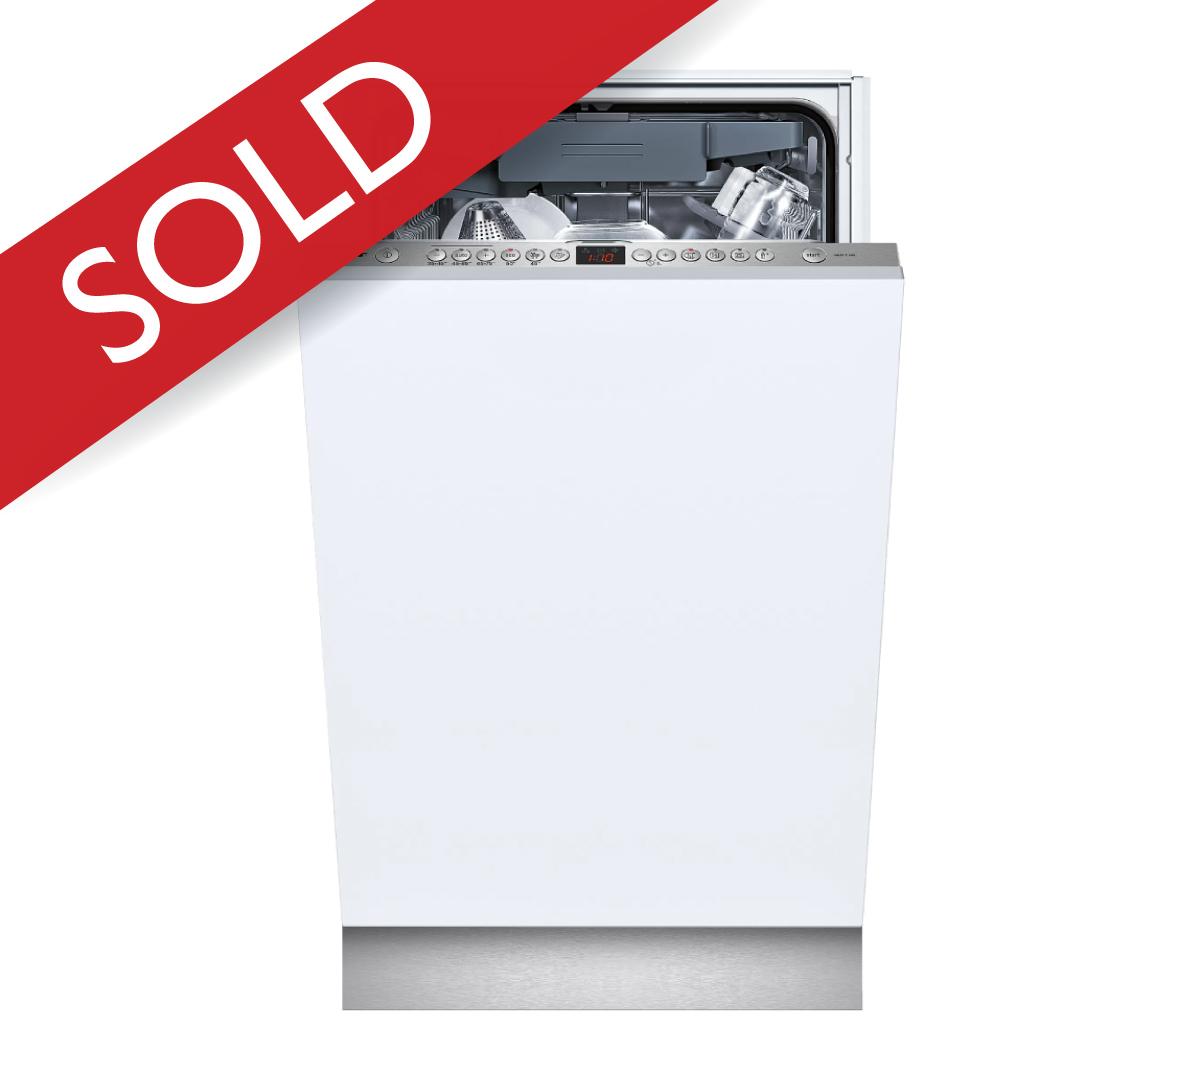 N70fully-integrated dishwasher45cm